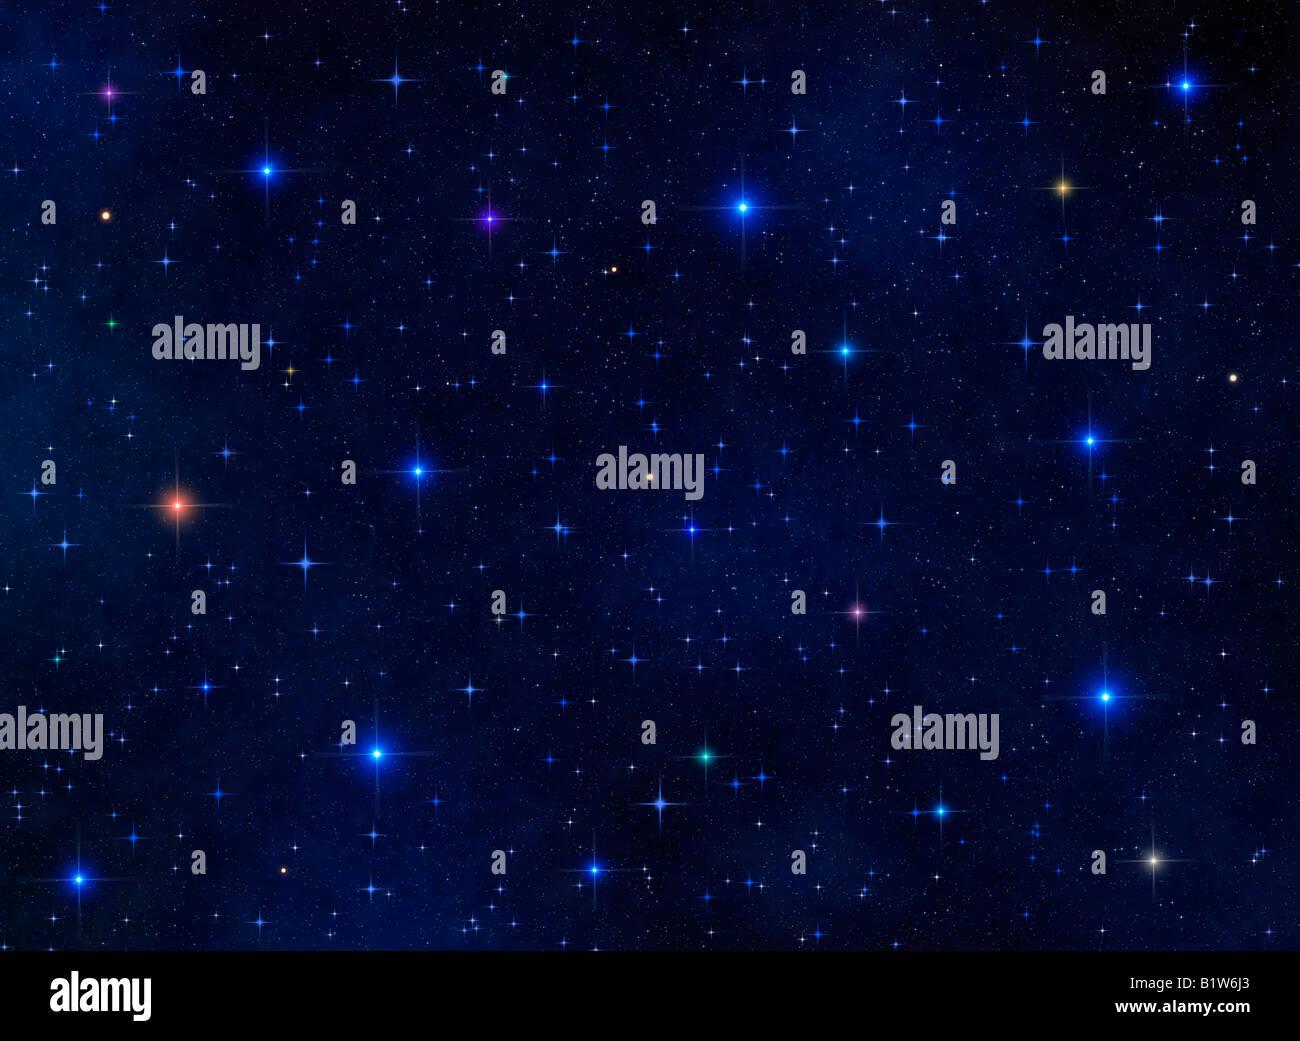 Universum Ansicht Abbildung Stockbild